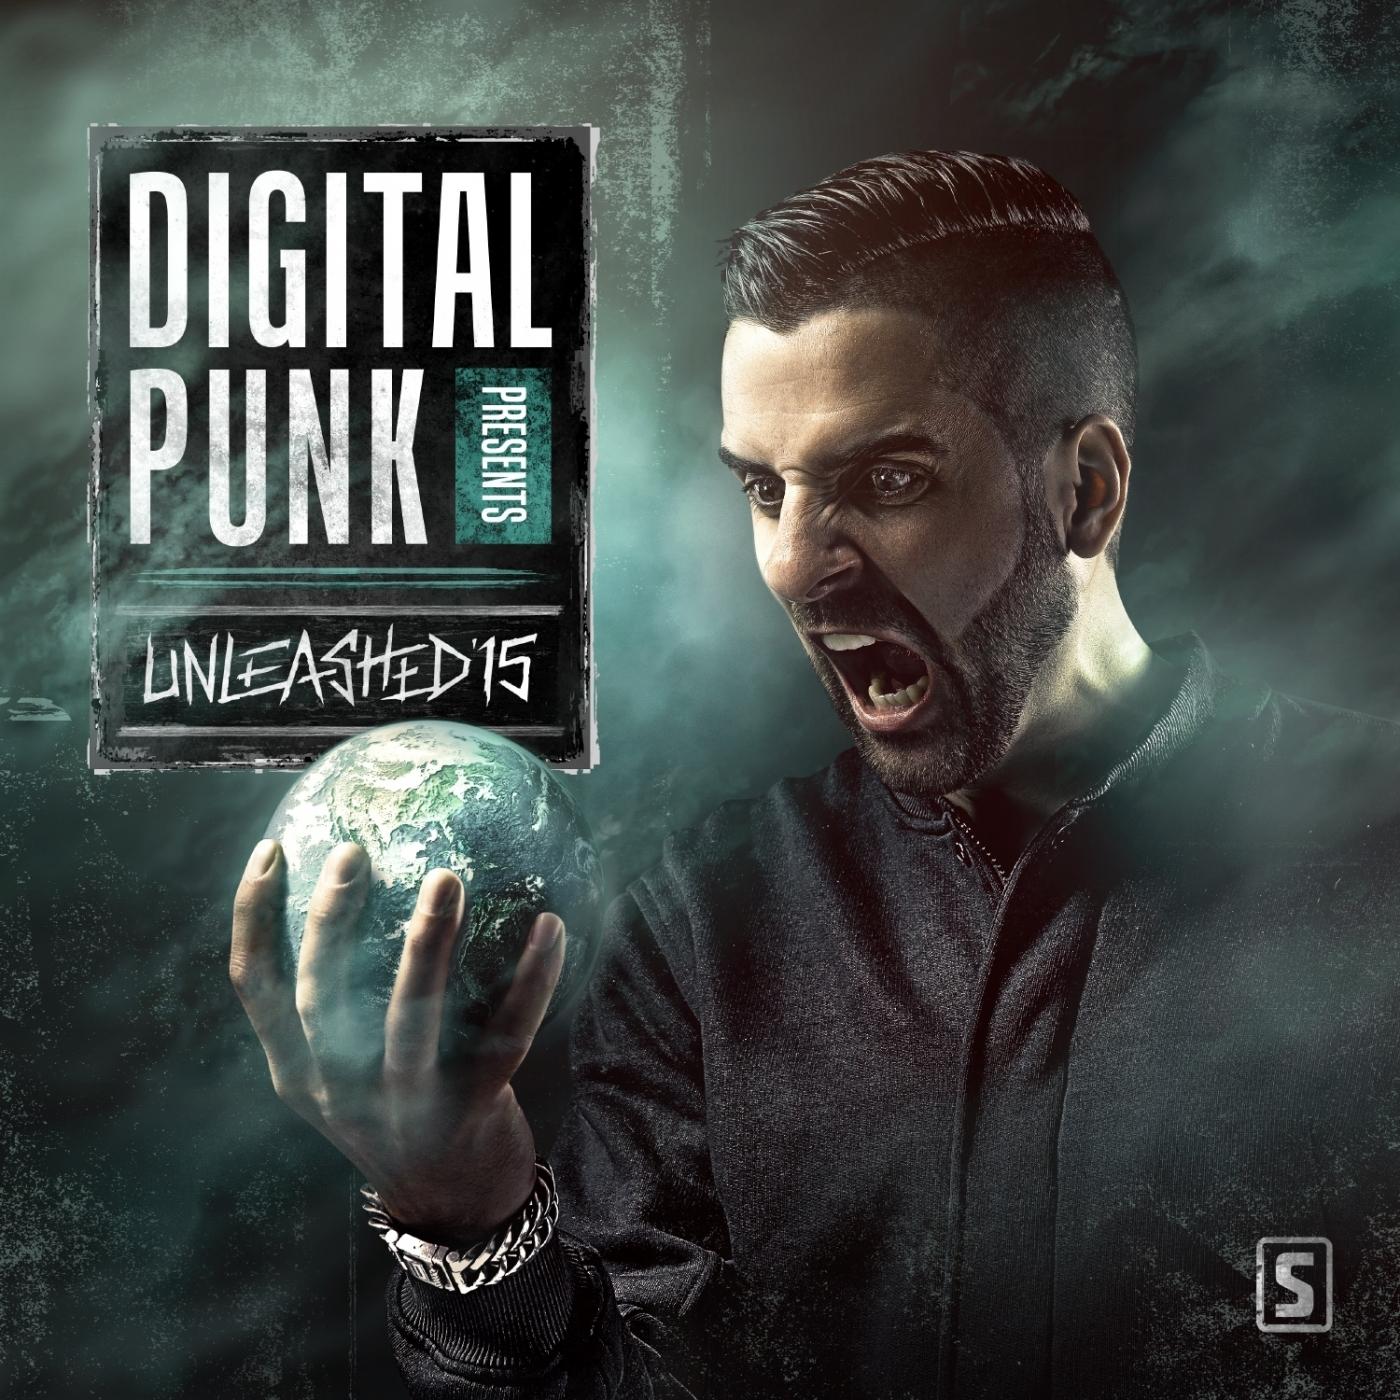 Digital Punk presents Unleashed (SCCD012) CD